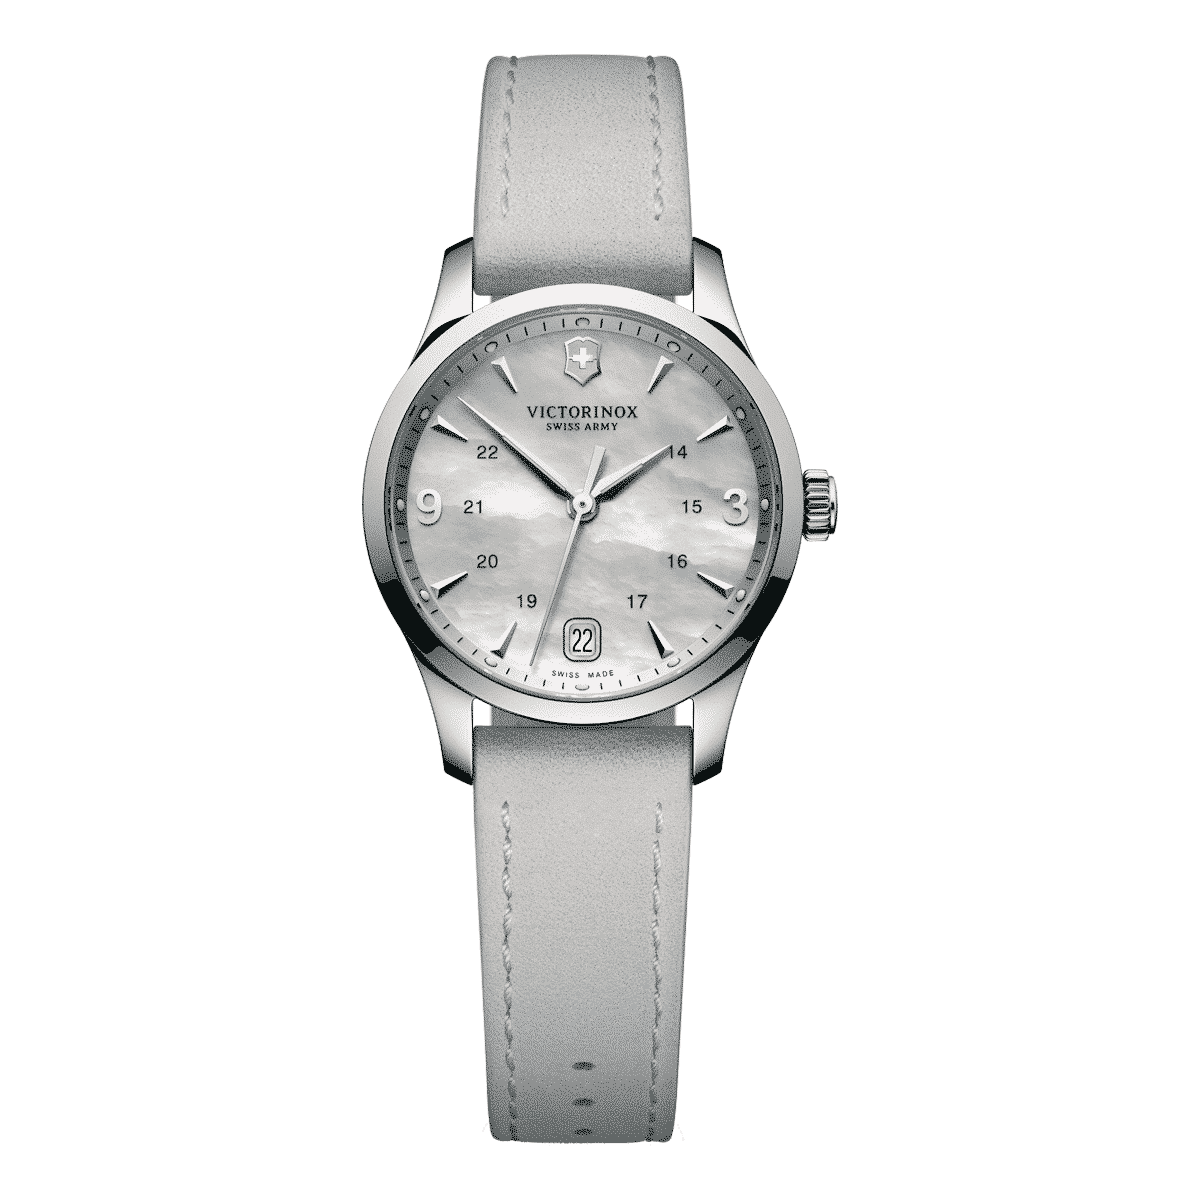 Victorinox-Alliance-Small-241662 Lionel Meylan Horlogerie Joaillerie Vevey